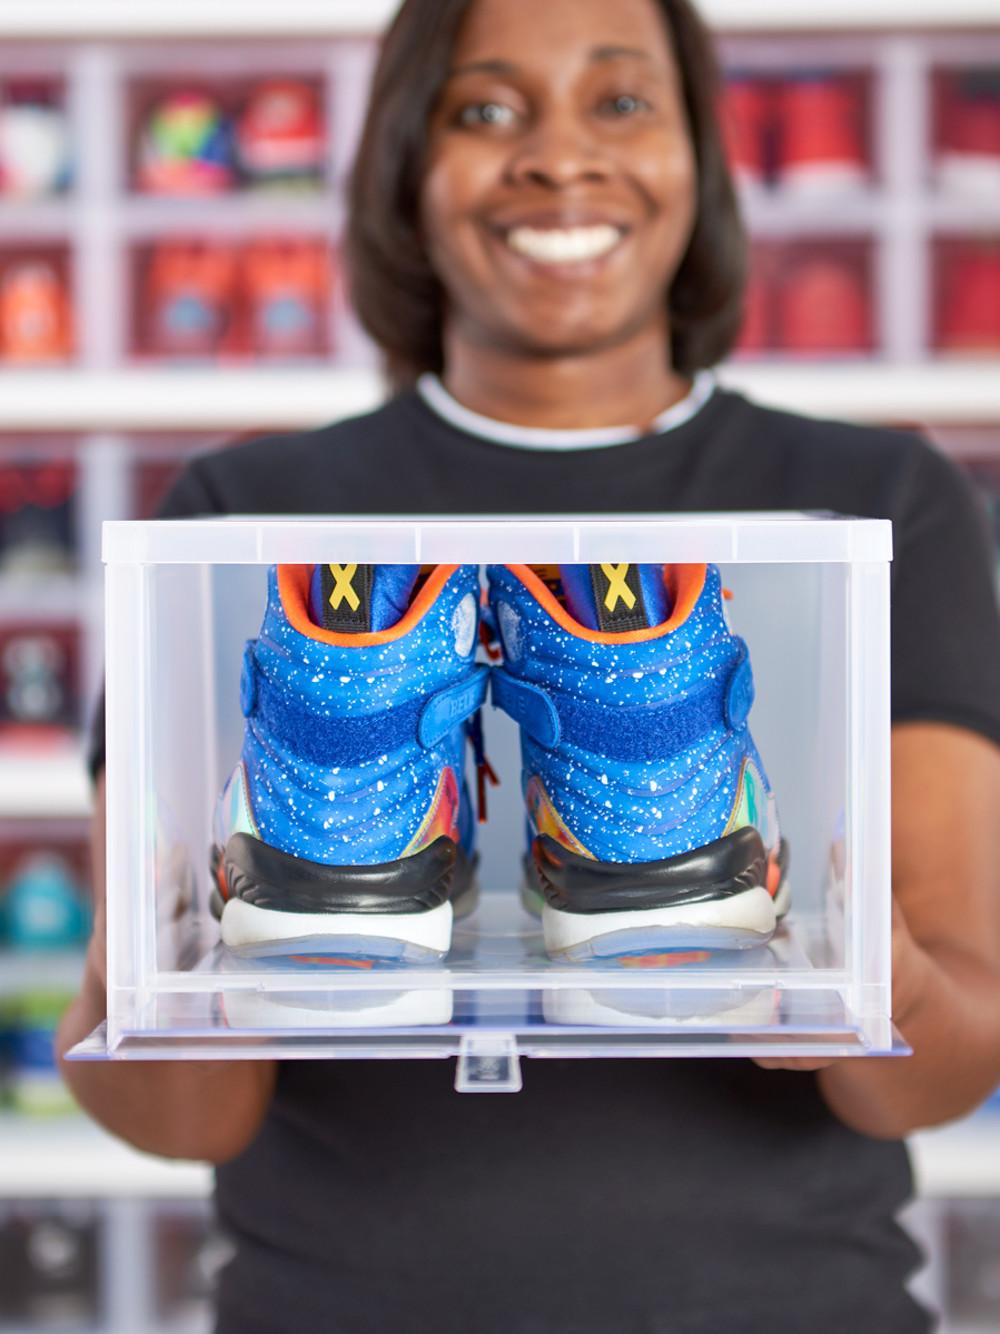 Sneakerhead Storage Ideas: Spotlight on Maggie Sauls | Container ...